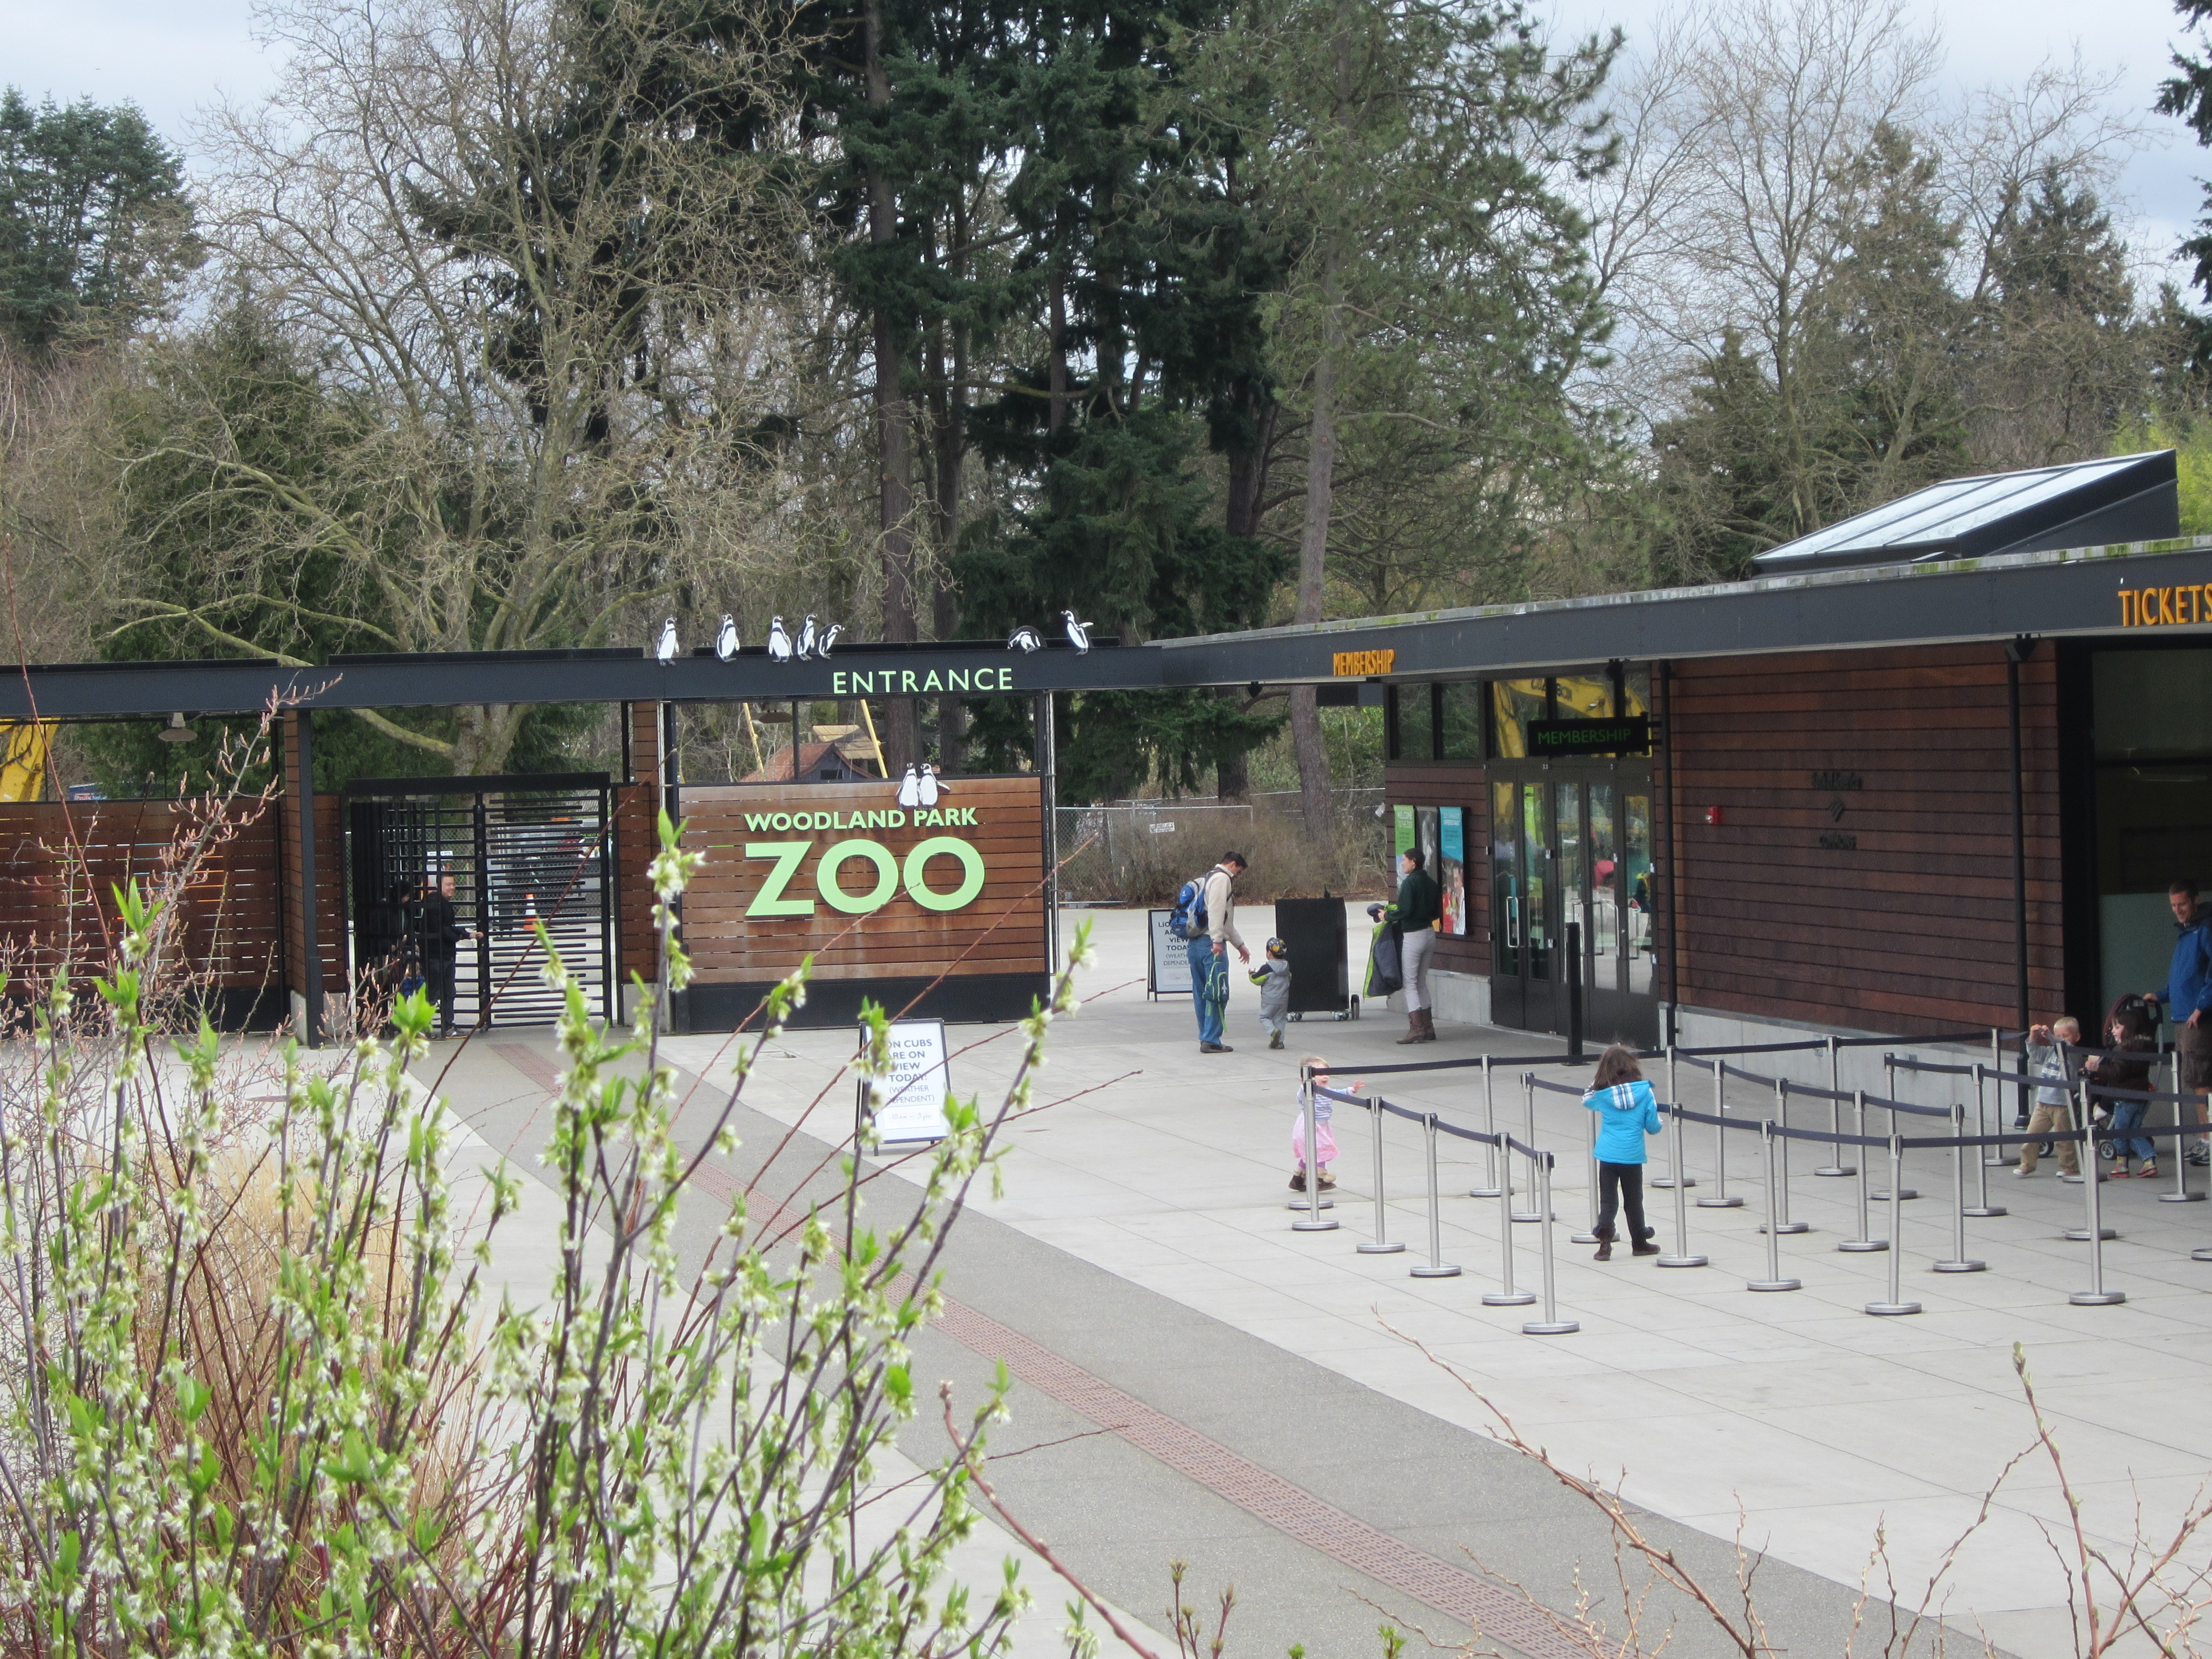 Woodland Park Zoo Entrance.JPG